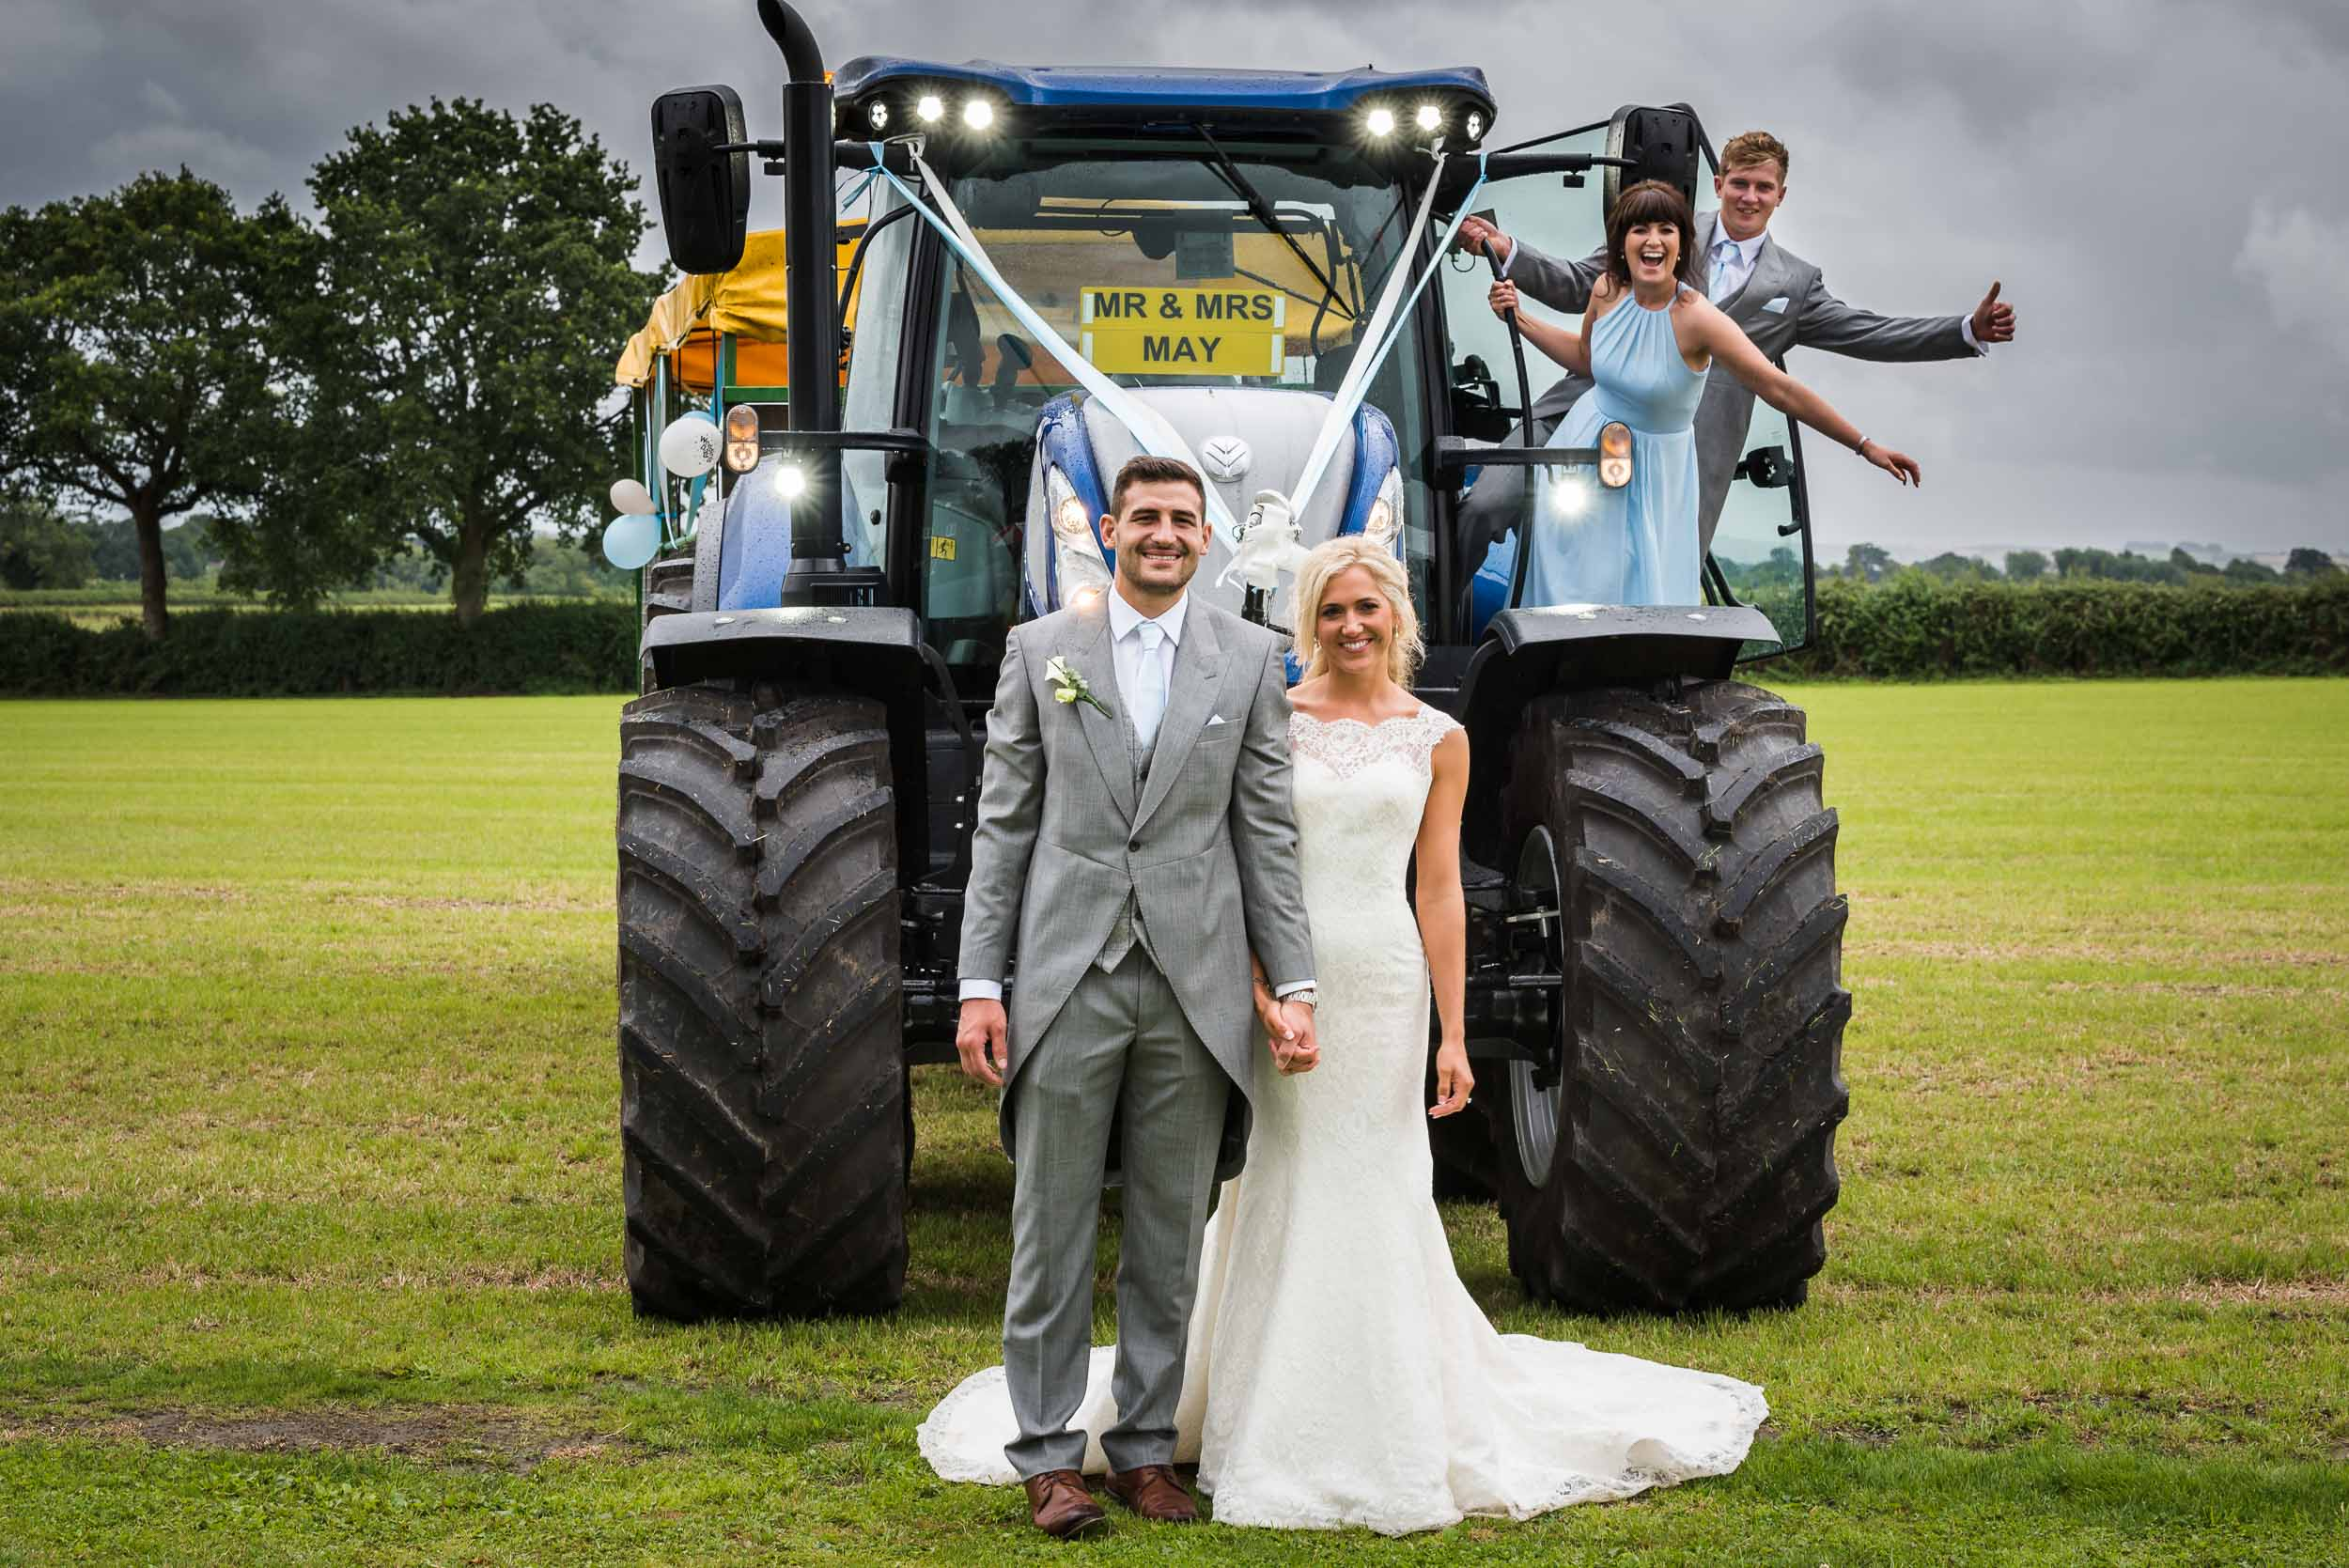 NC-20170722-sophie-and-jonny-wedding-0483.jpg